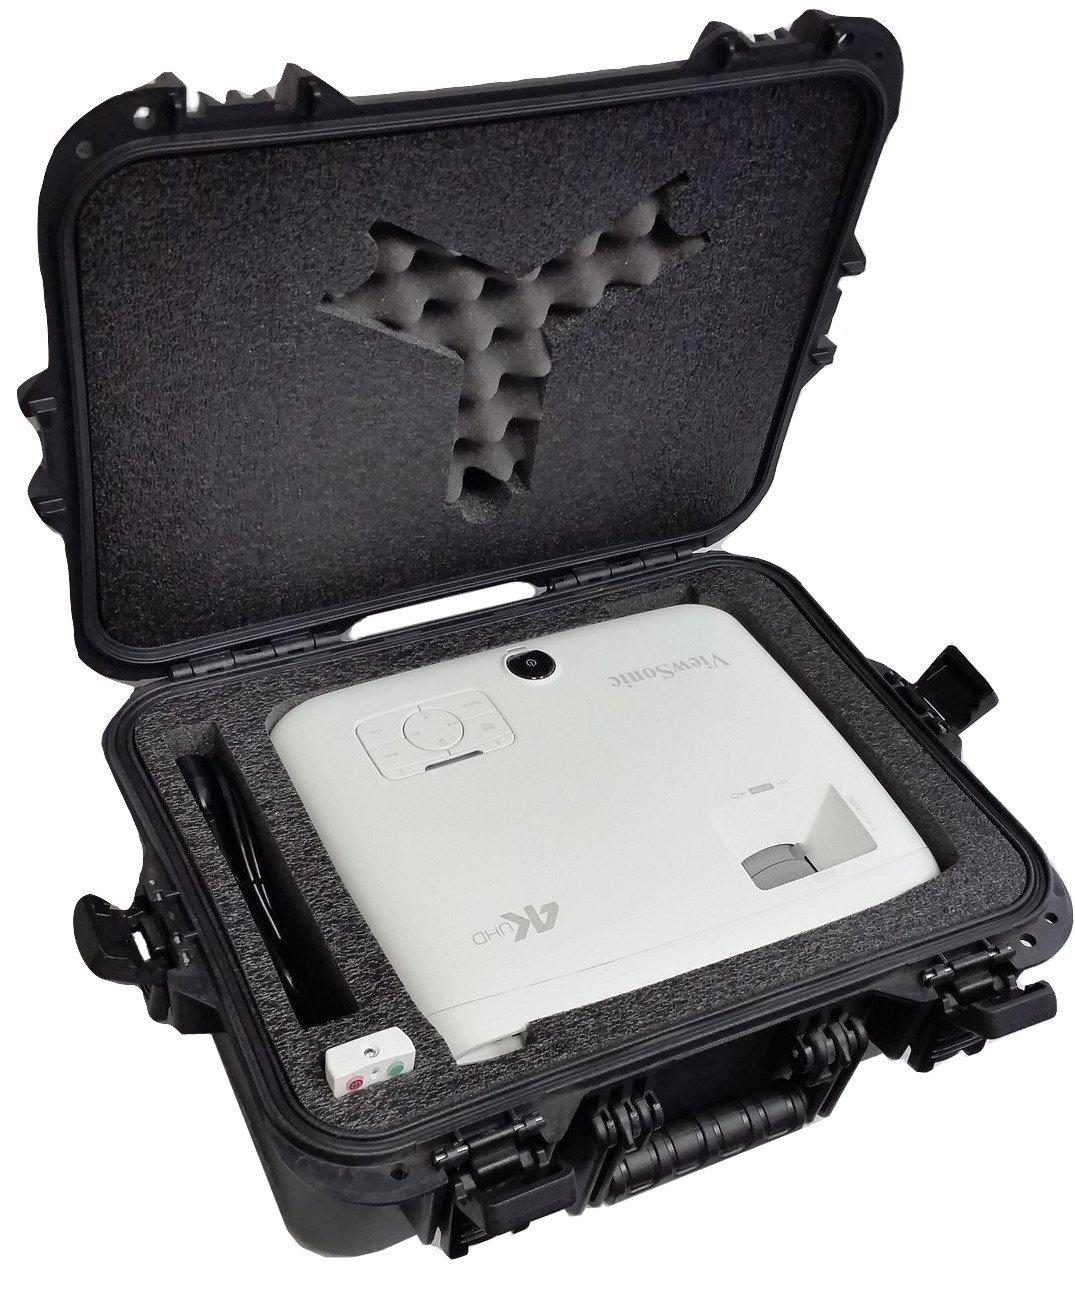 ViewSonic Compatible PX747-4k, PX727-4K, PX700HD Case Club Projector Case